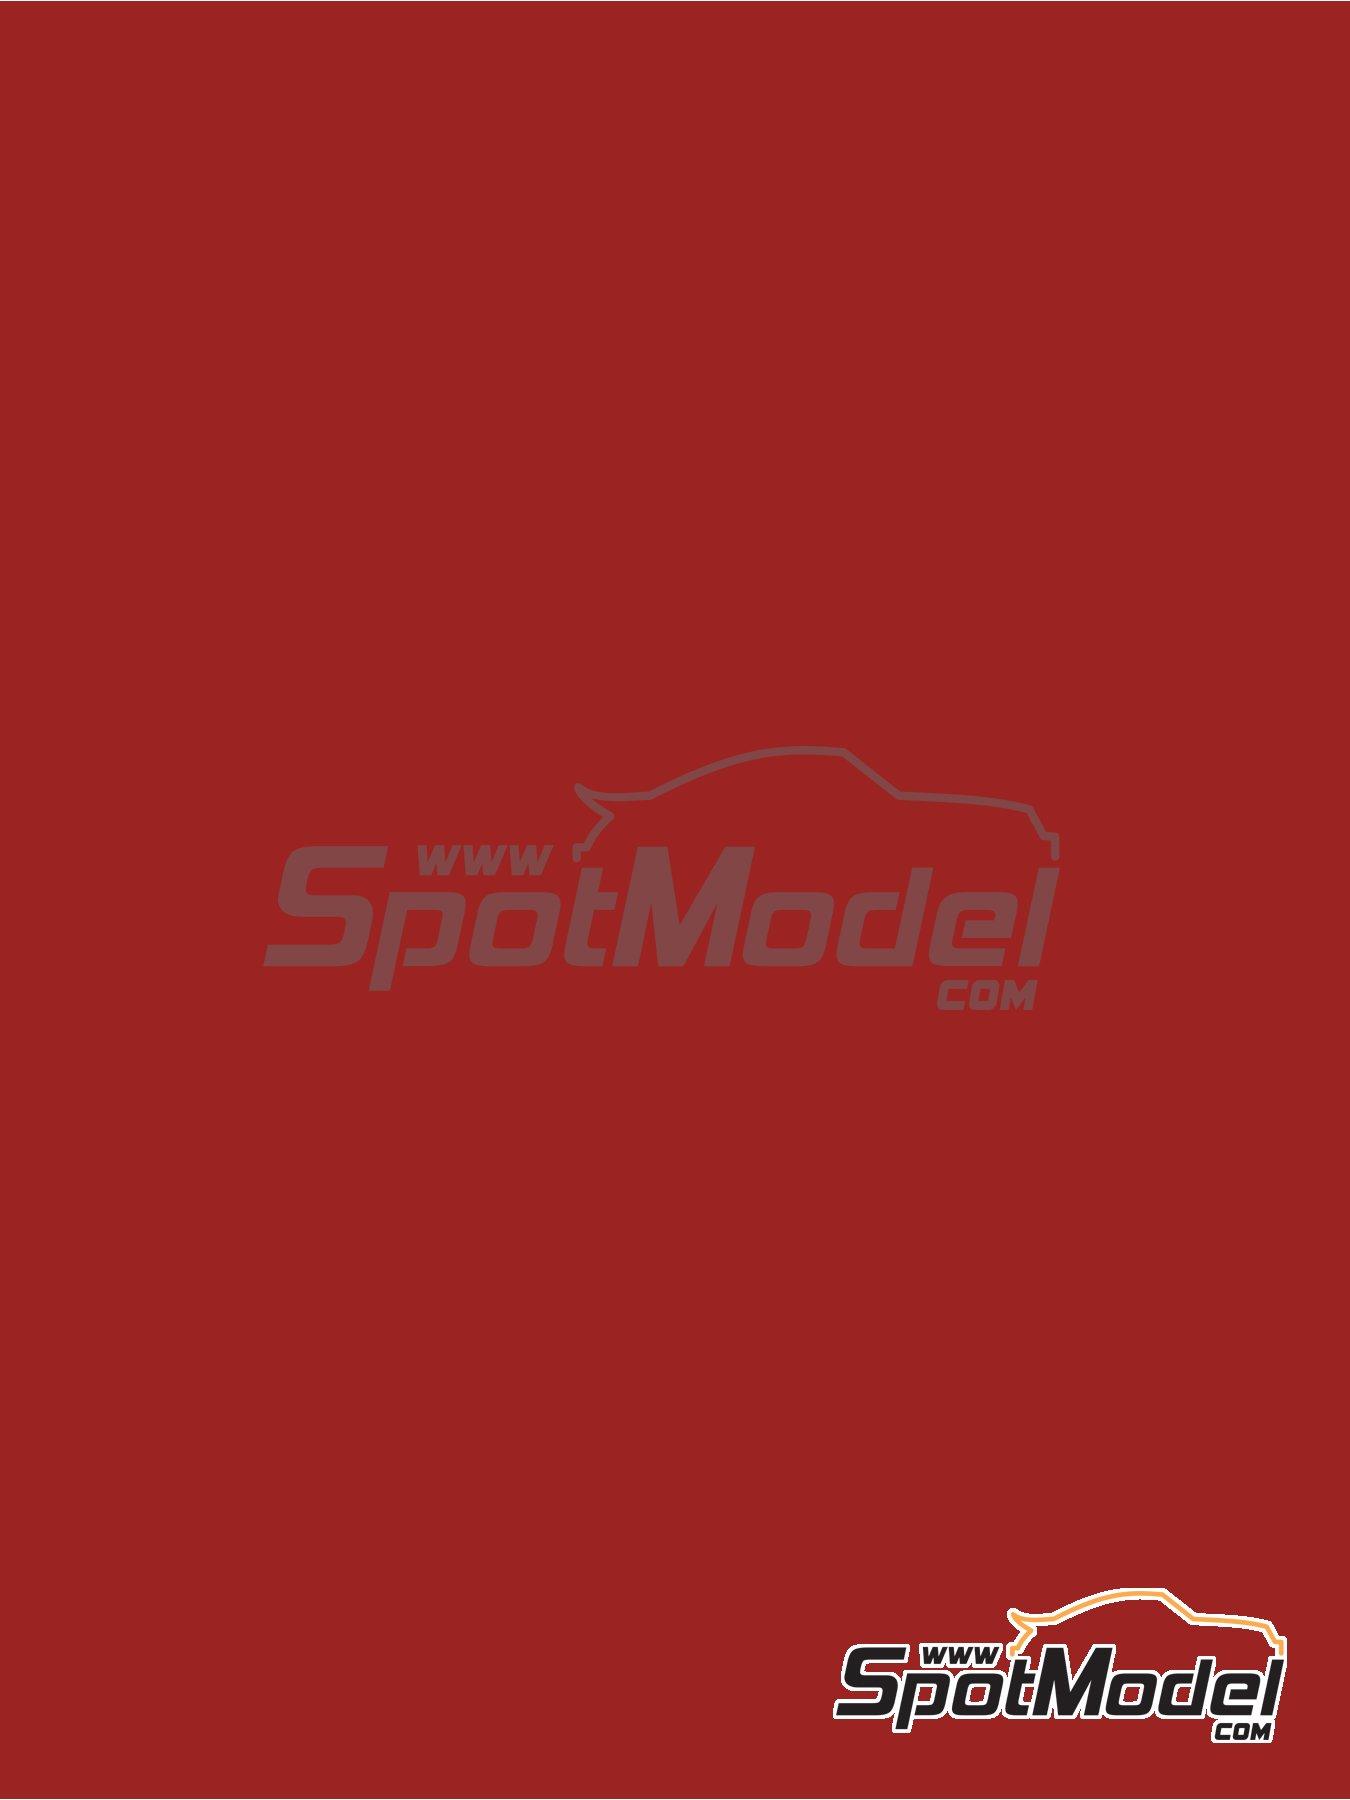 Rojo carmin - RAL3002 - Carmine red - 1 x 60ml | Pintura fabricado por Zero Paints (ref.ZP-1033-RAL3002) image